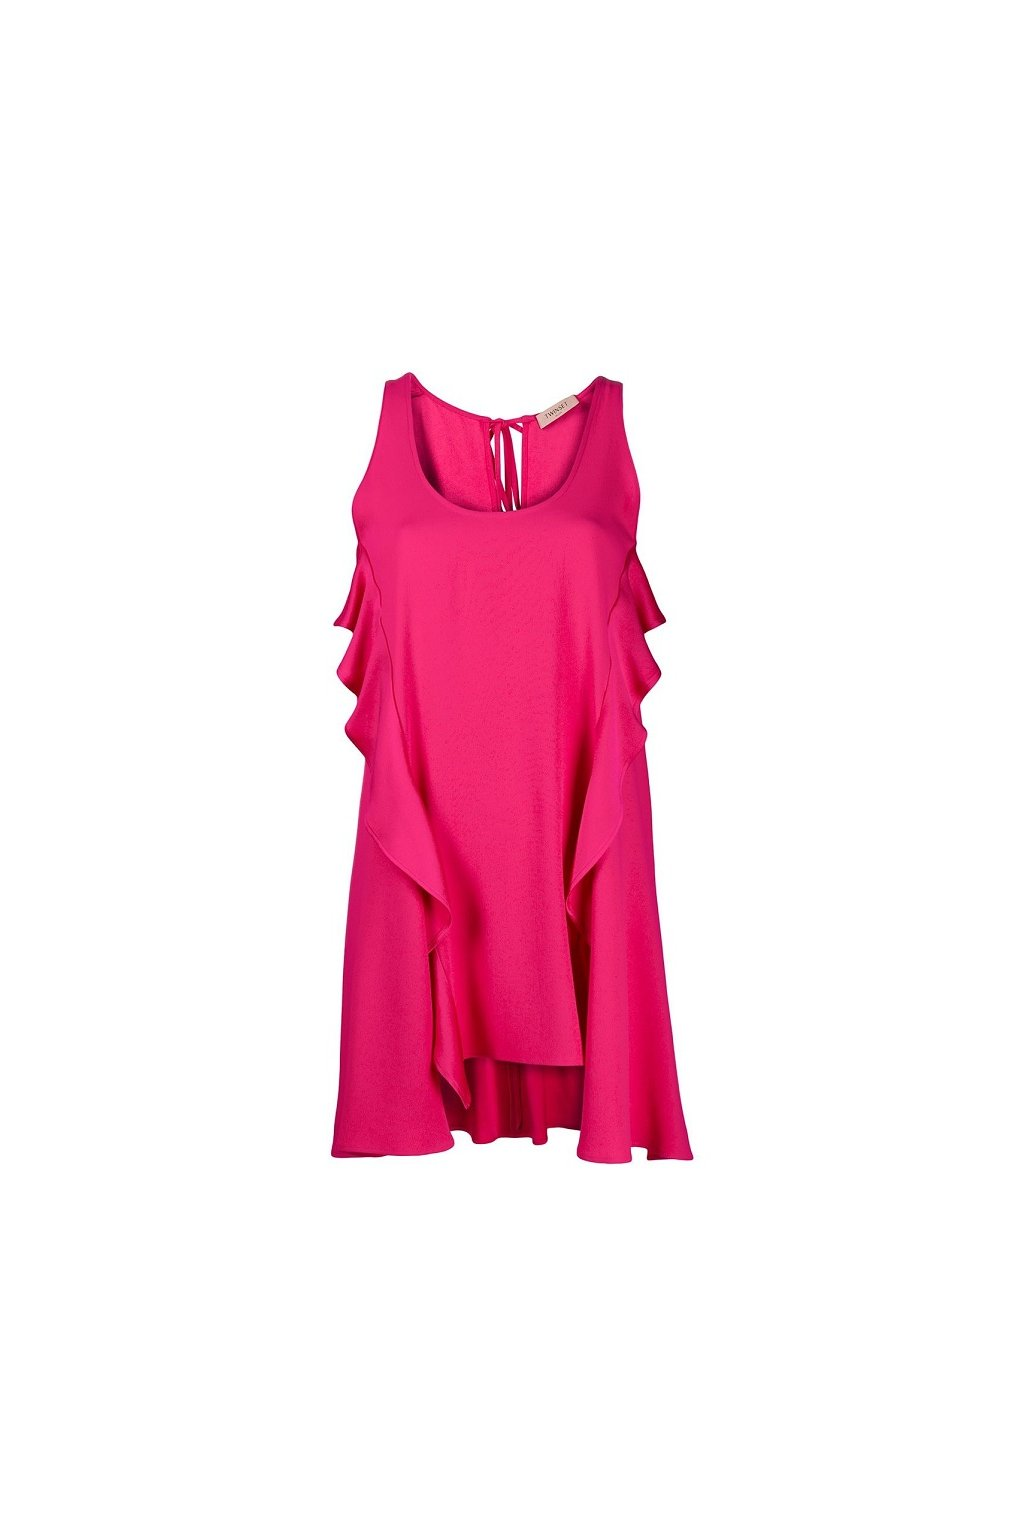 201TP2432 Dámské šaty Twinset růžové